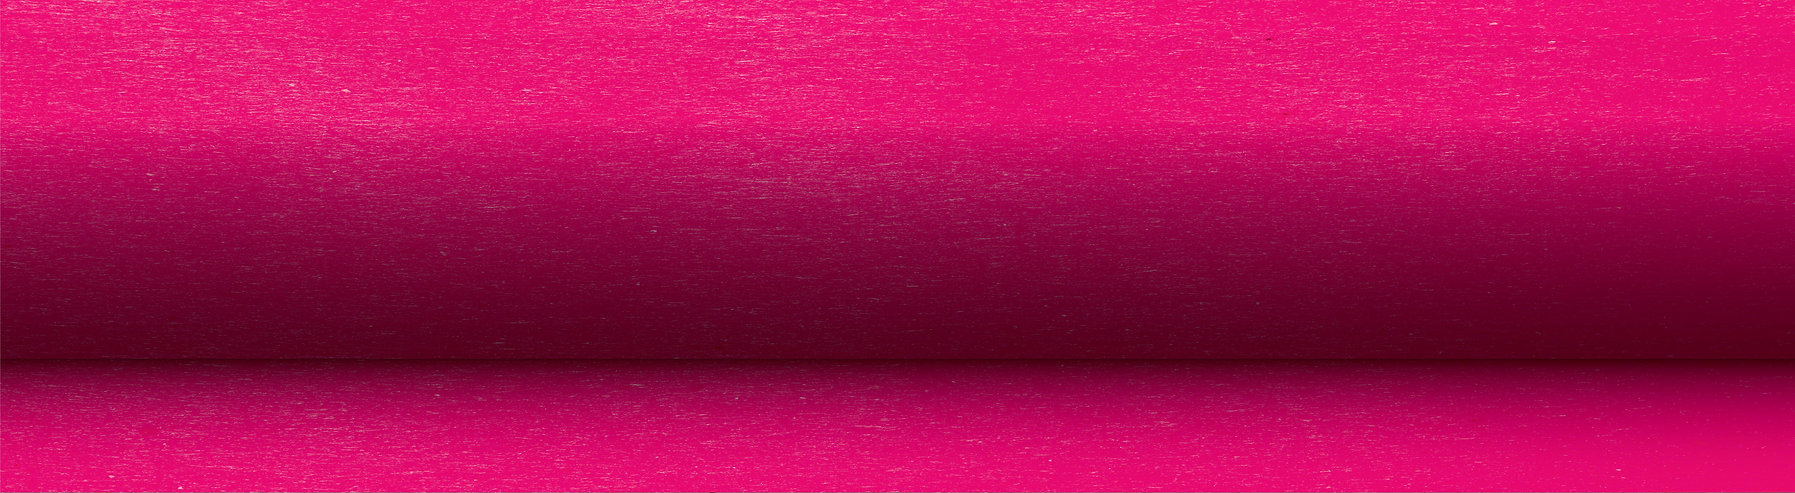 Pink-17.jpg